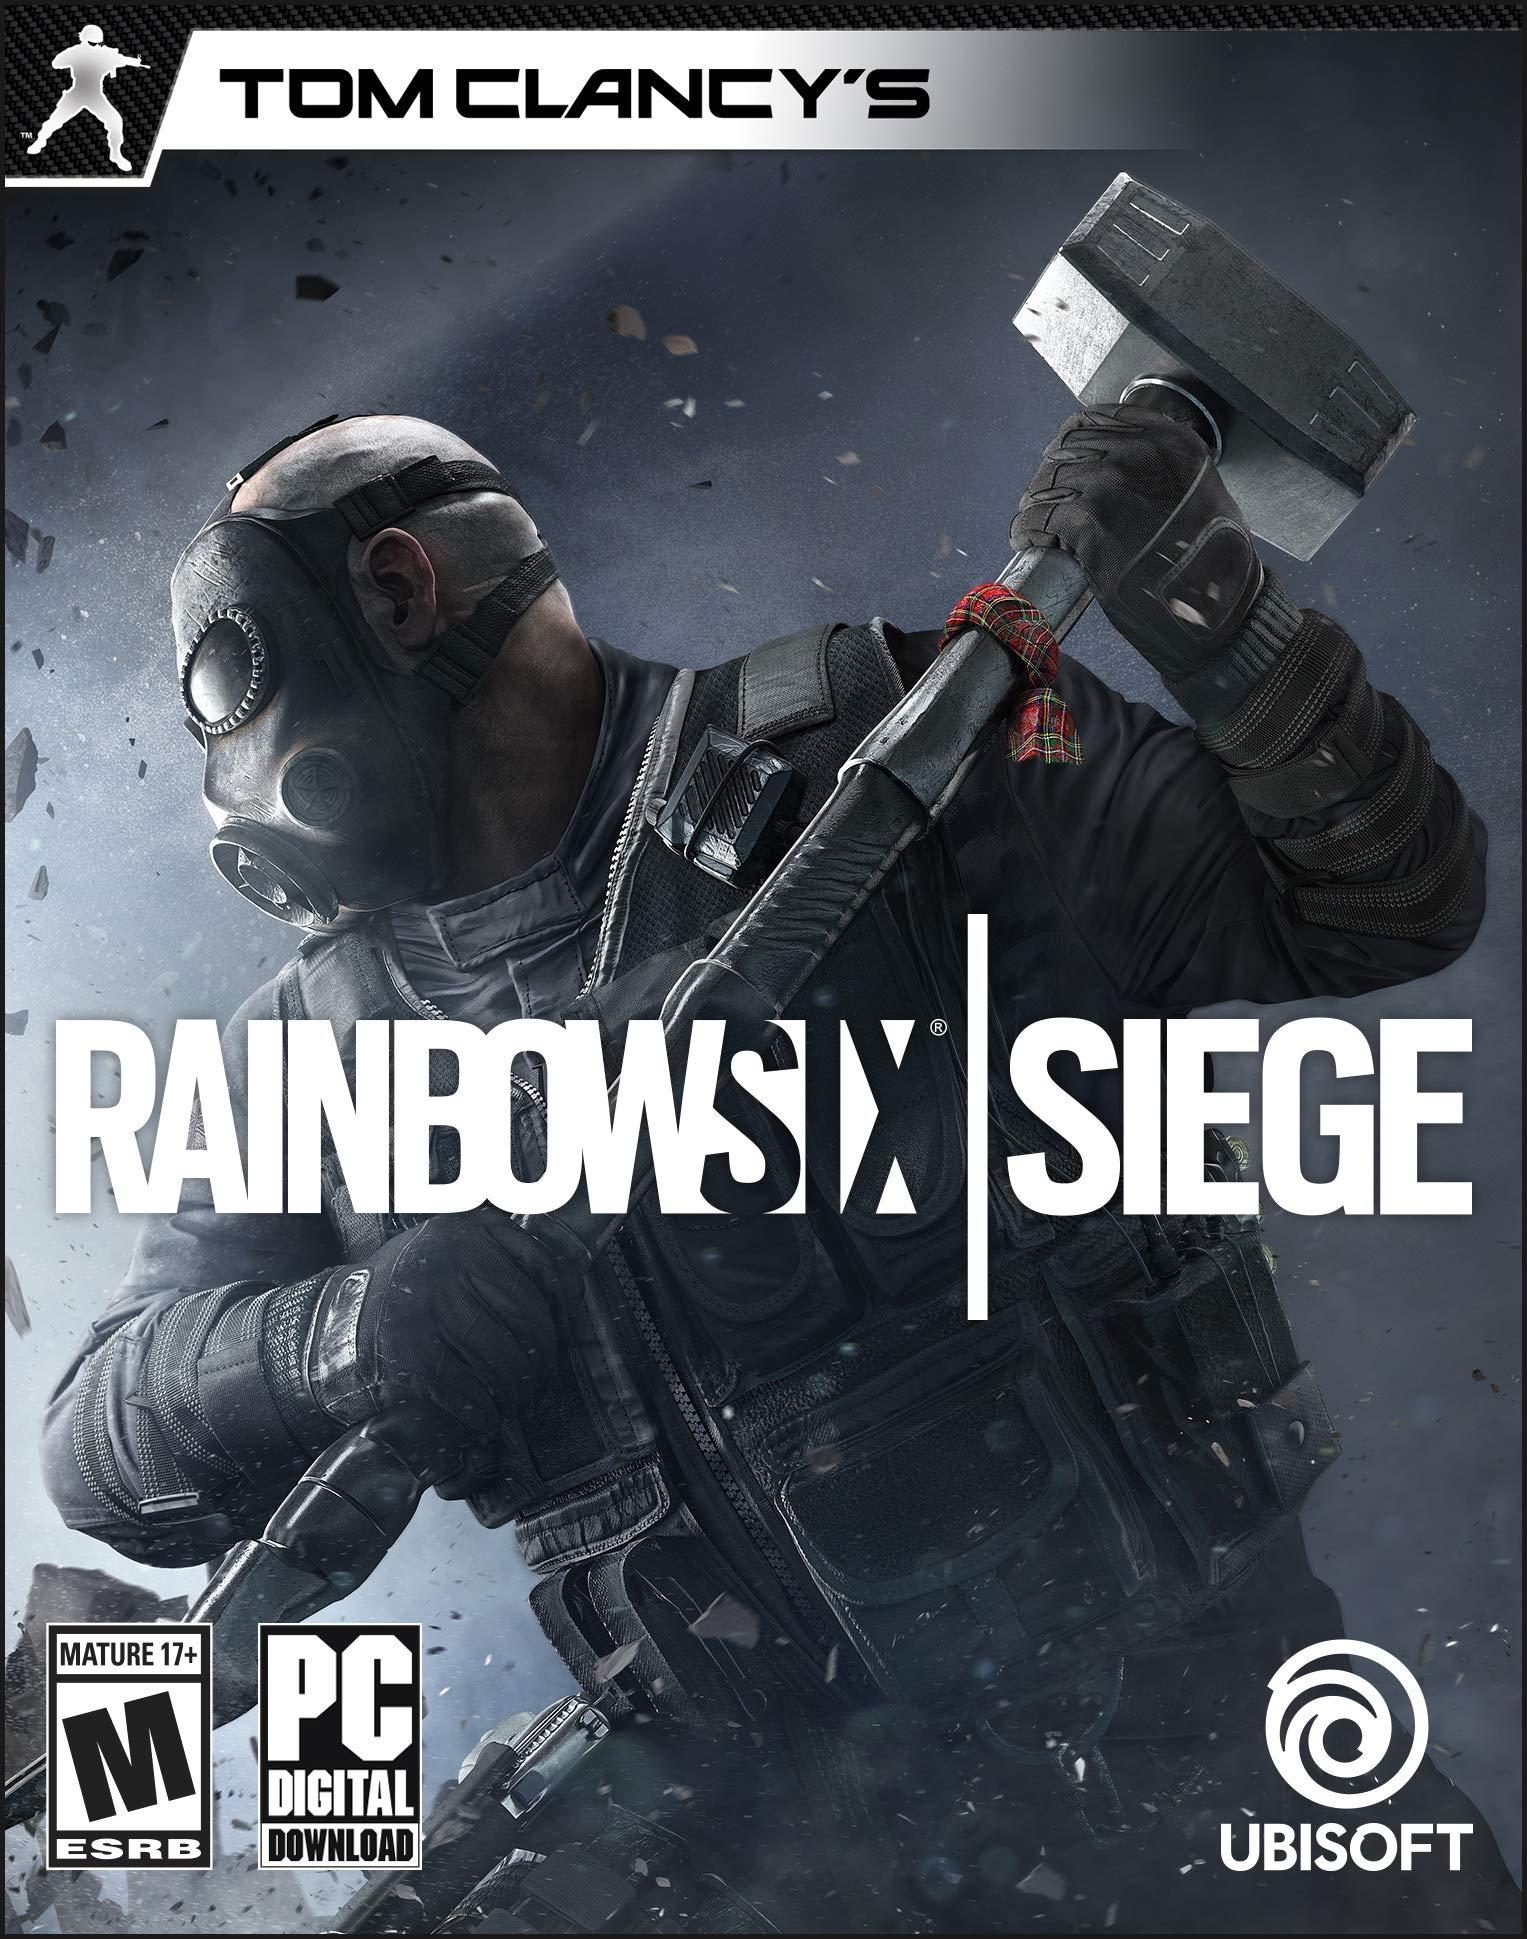 Tom Clancy's Rainbow Six Siege [Online Game Code] by Ubisoft